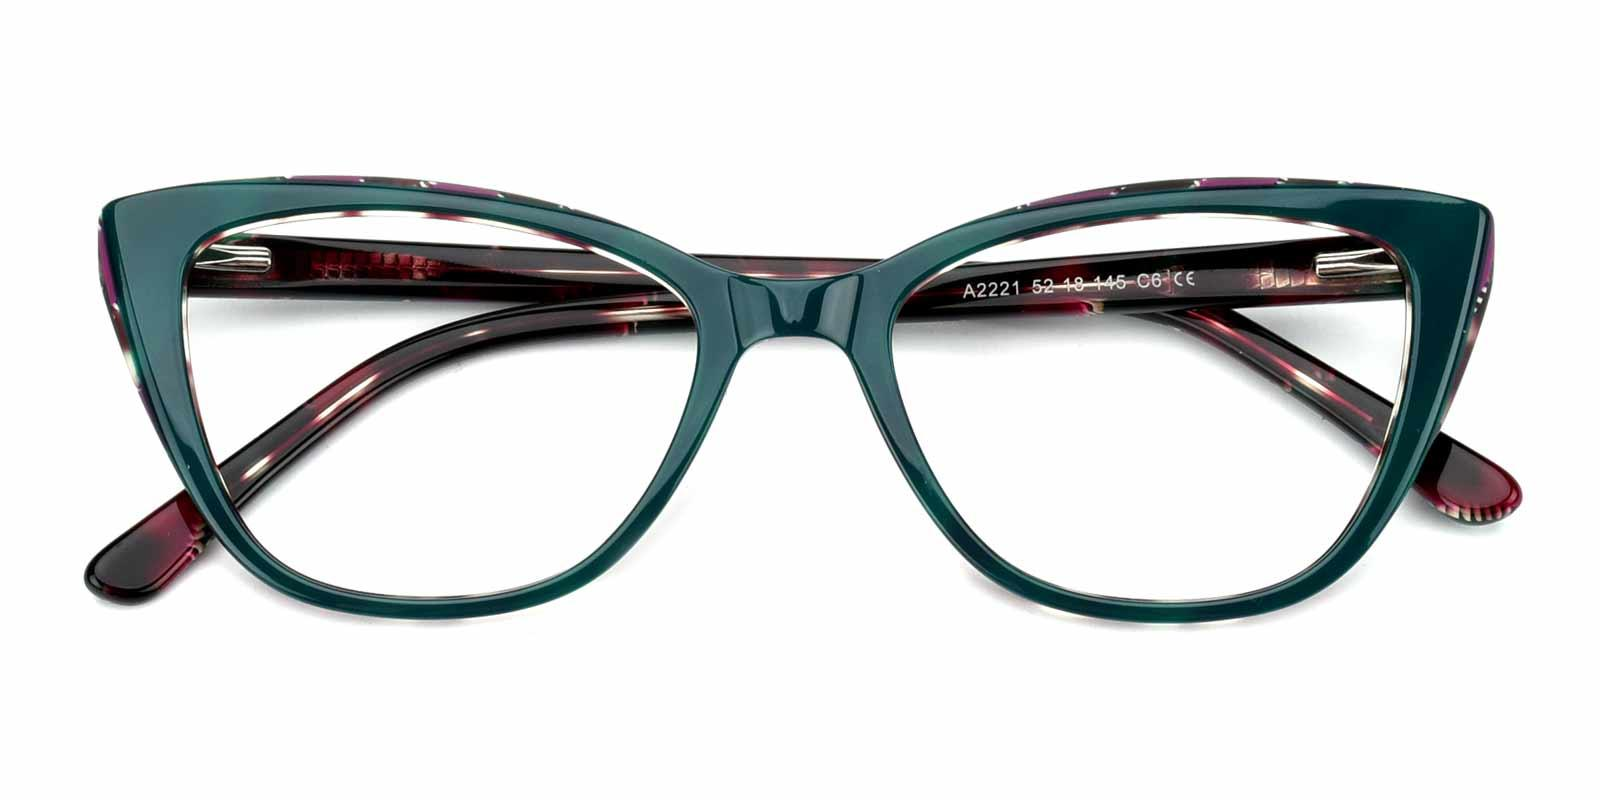 Amy-Green-Cat-Acetate-Eyeglasses-detail